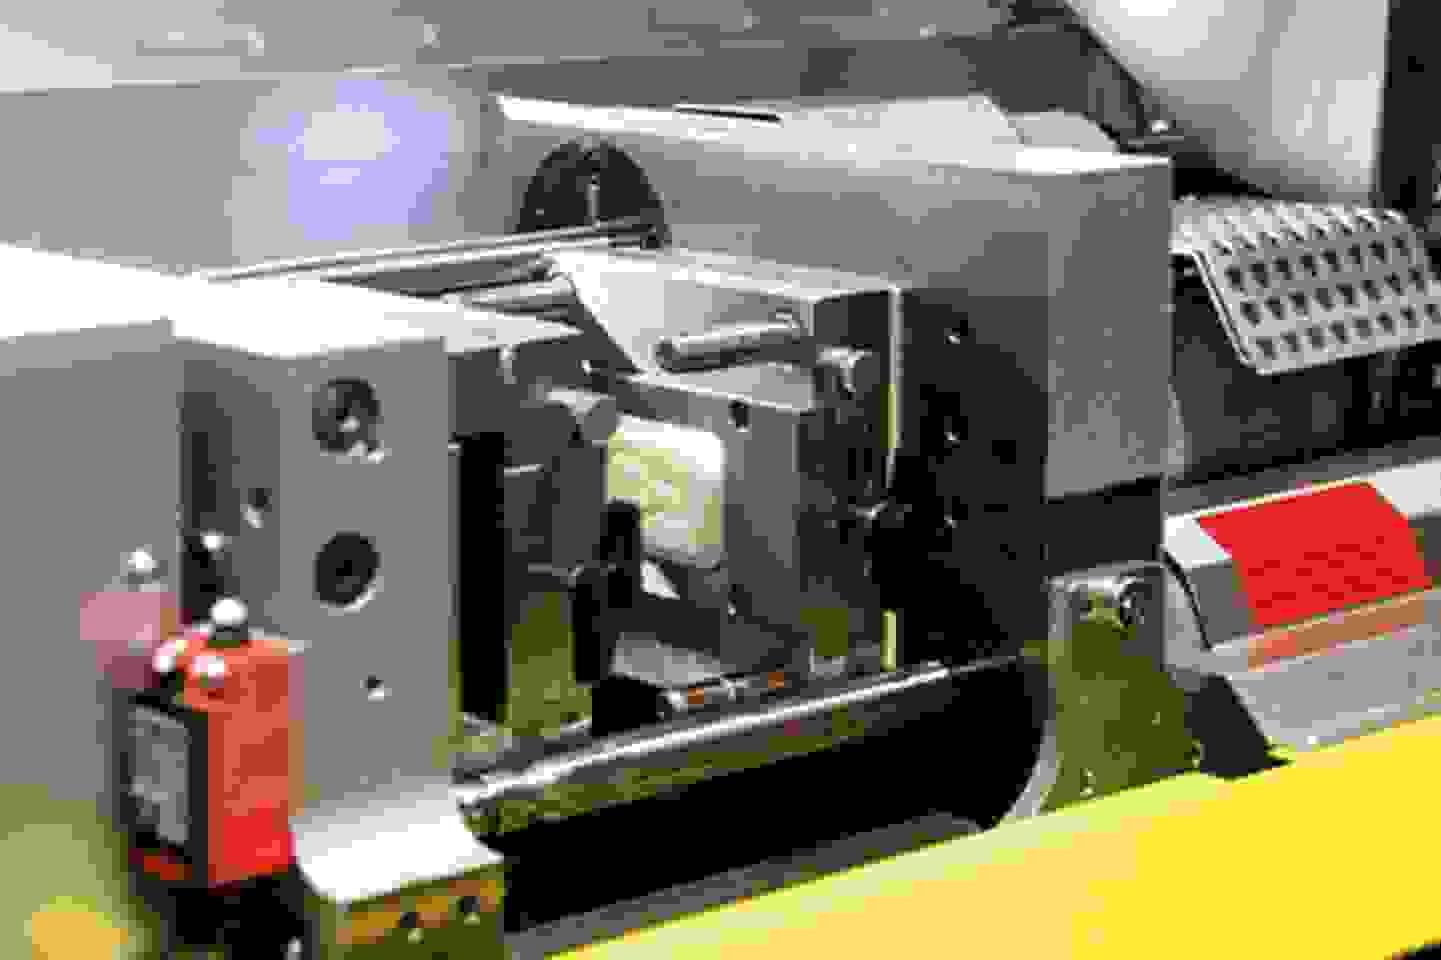 bs-crc-kunststoffverarbeitung-11